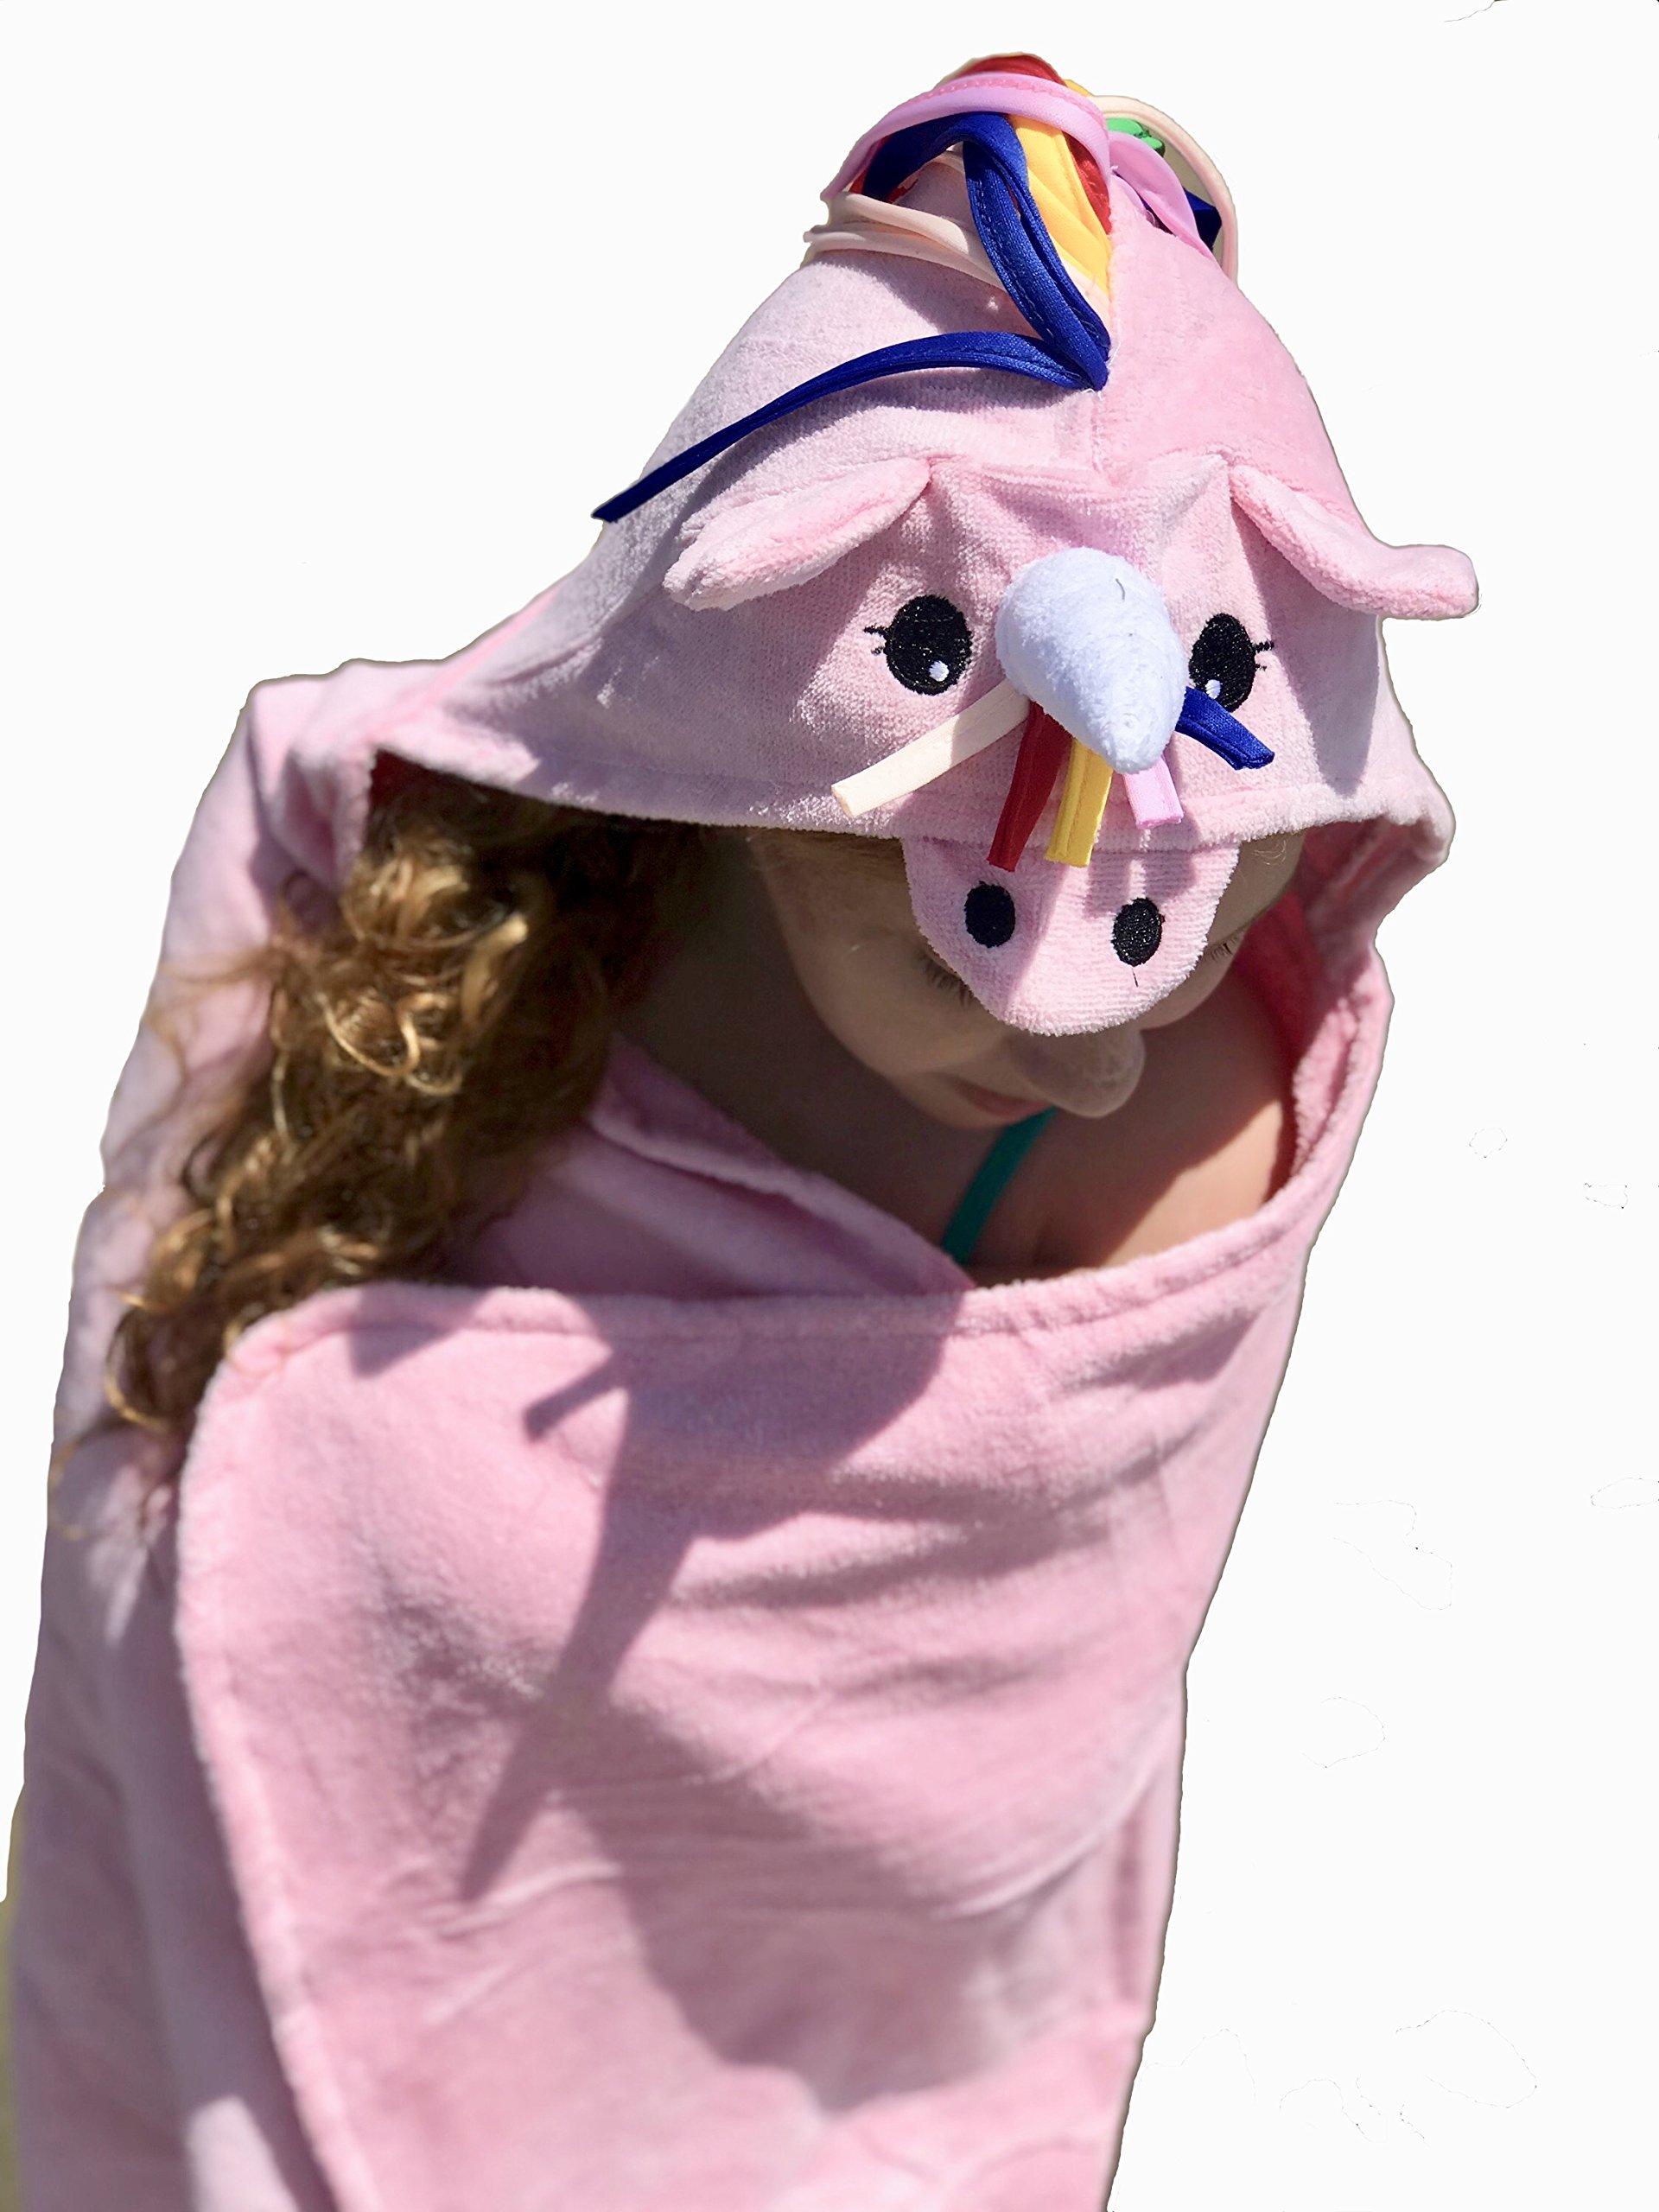 Mermaid's Kisses Hooded Pink Rainbow Unicorn Horn Towel with Matching Bath Mitt by Mermaid's Kisses